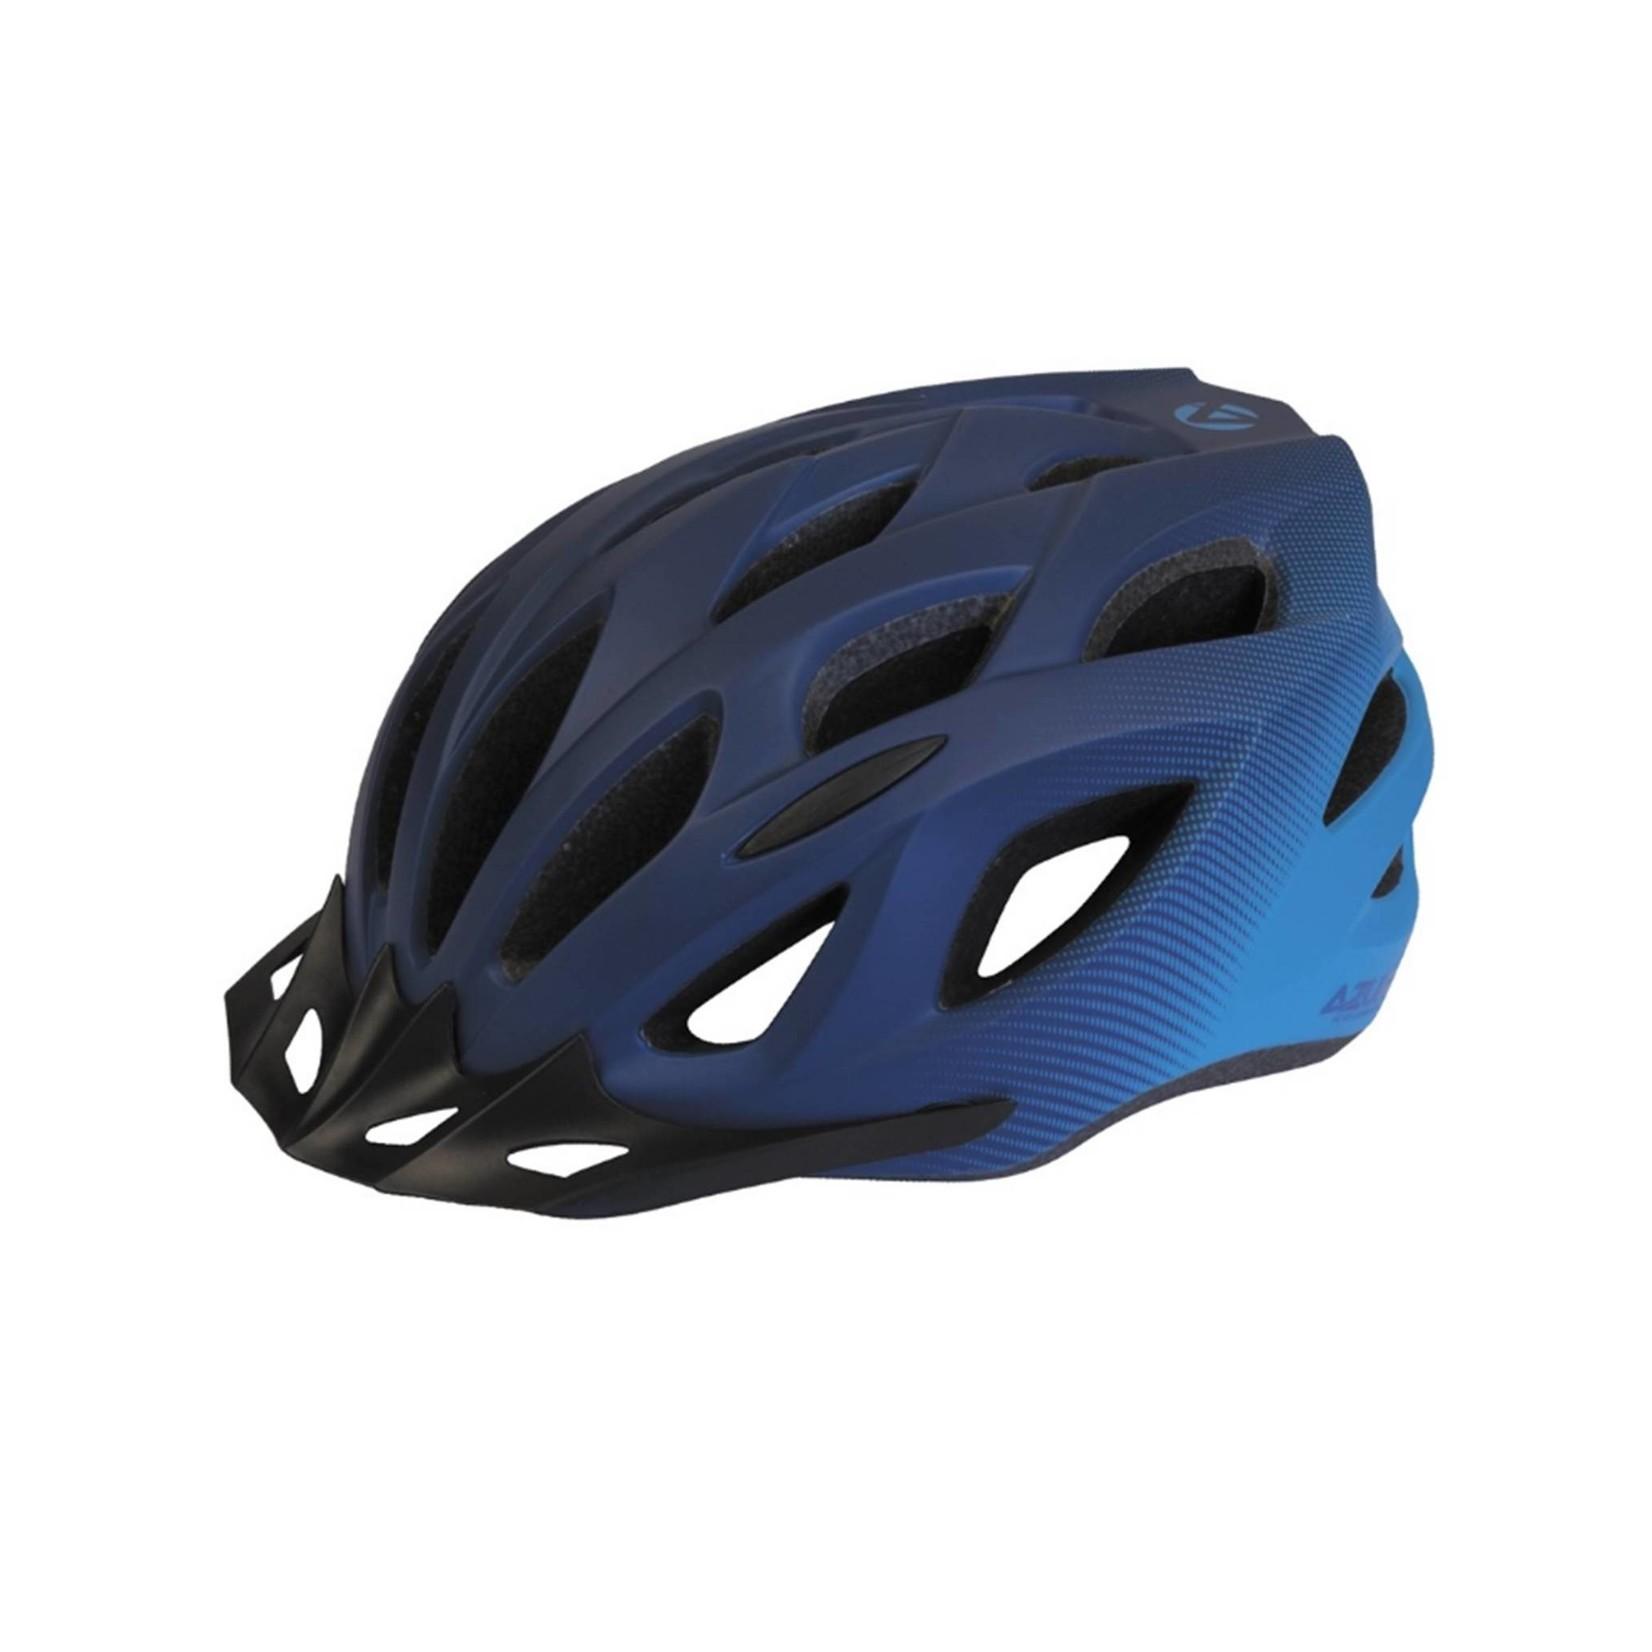 Azur L61 Satin Blue/Sky Fade Helmet